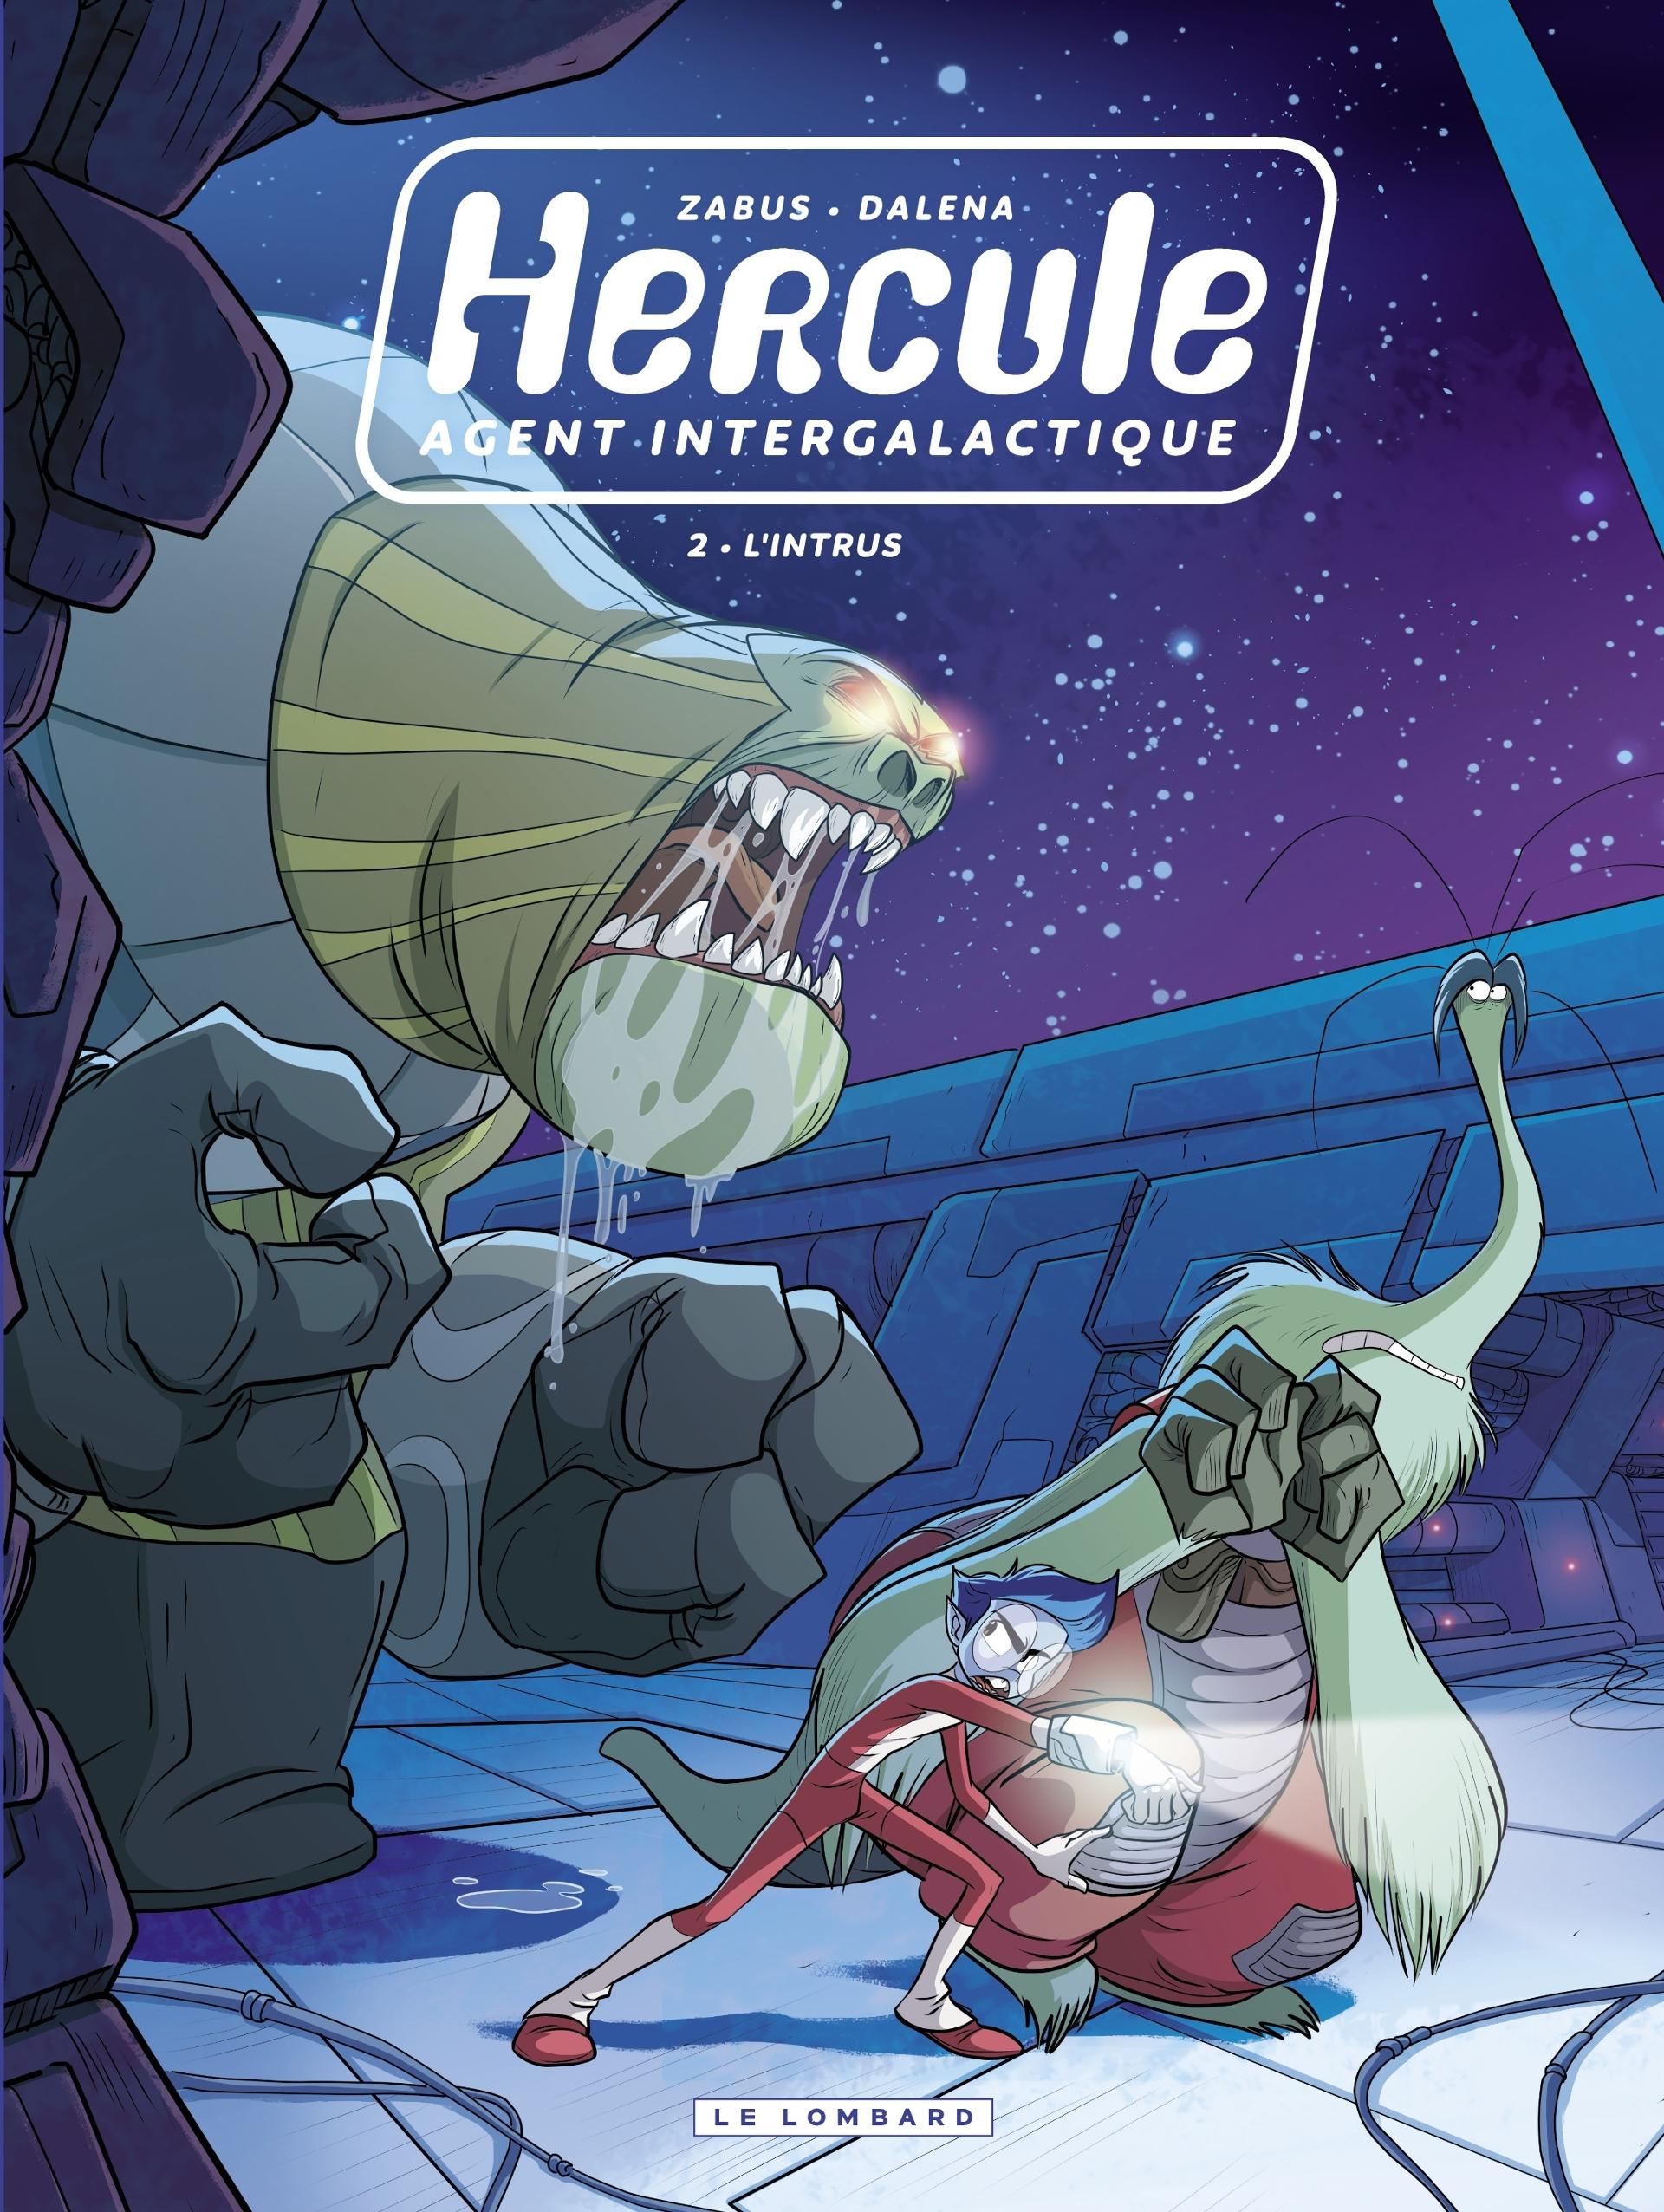 Hercule, agent intergalactique 2 - L'intrus